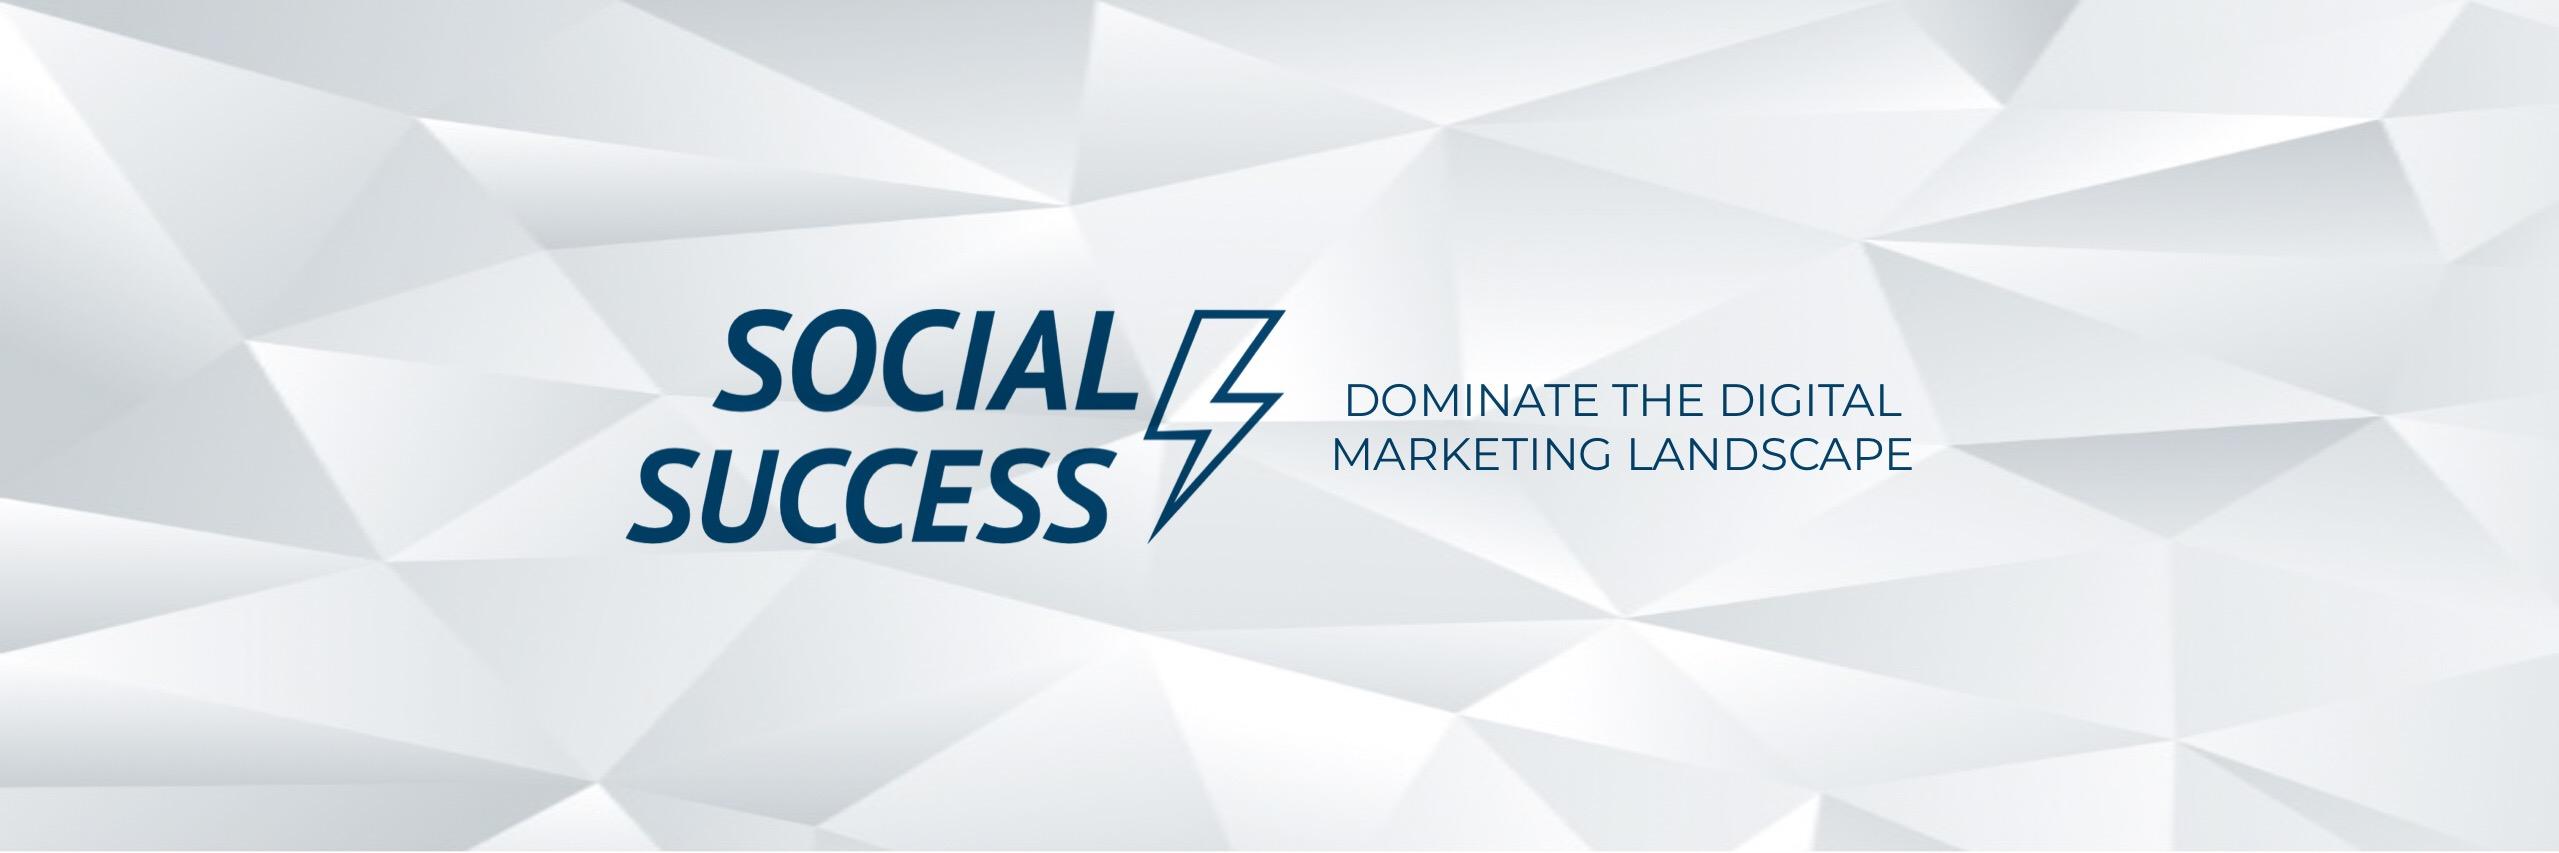 Social Success by Golden Medina Services AKA GMS